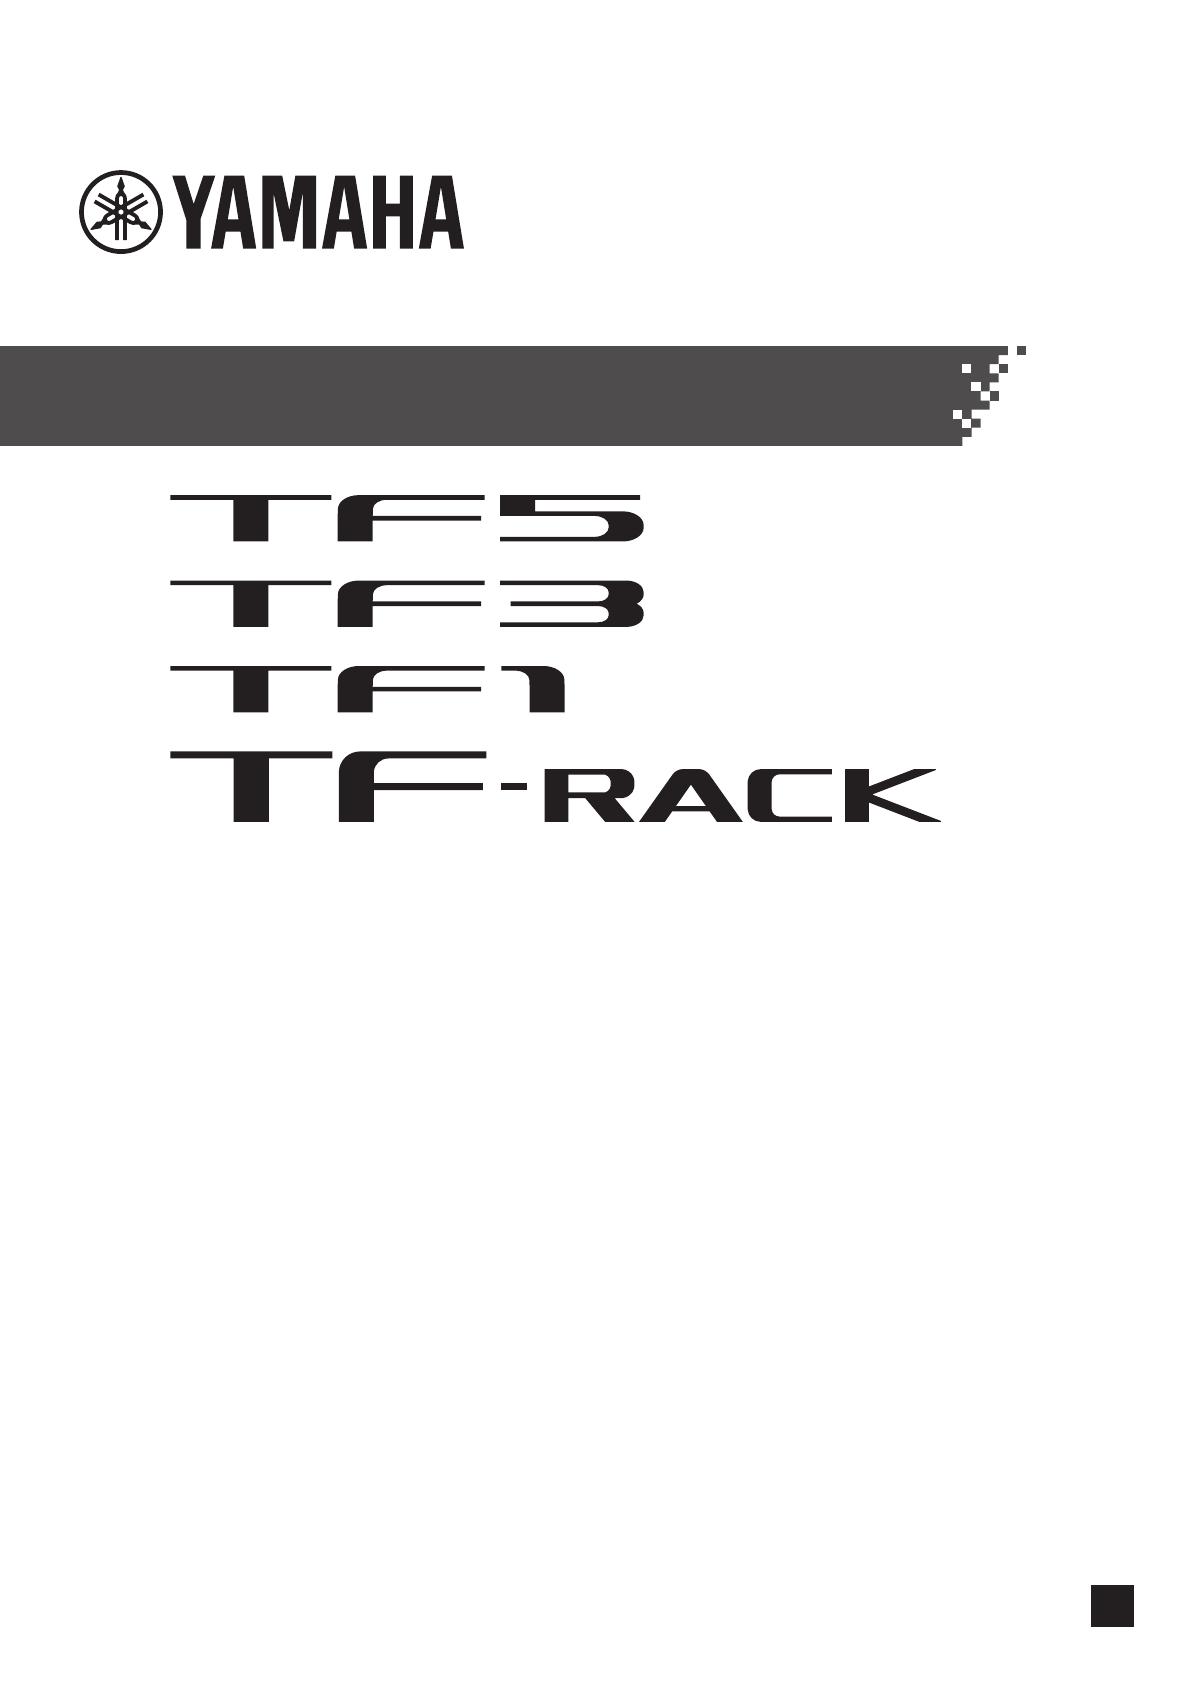 Yamaha TF5/TF3/TF1/TF RACK Manual De Usuario TF StageMix